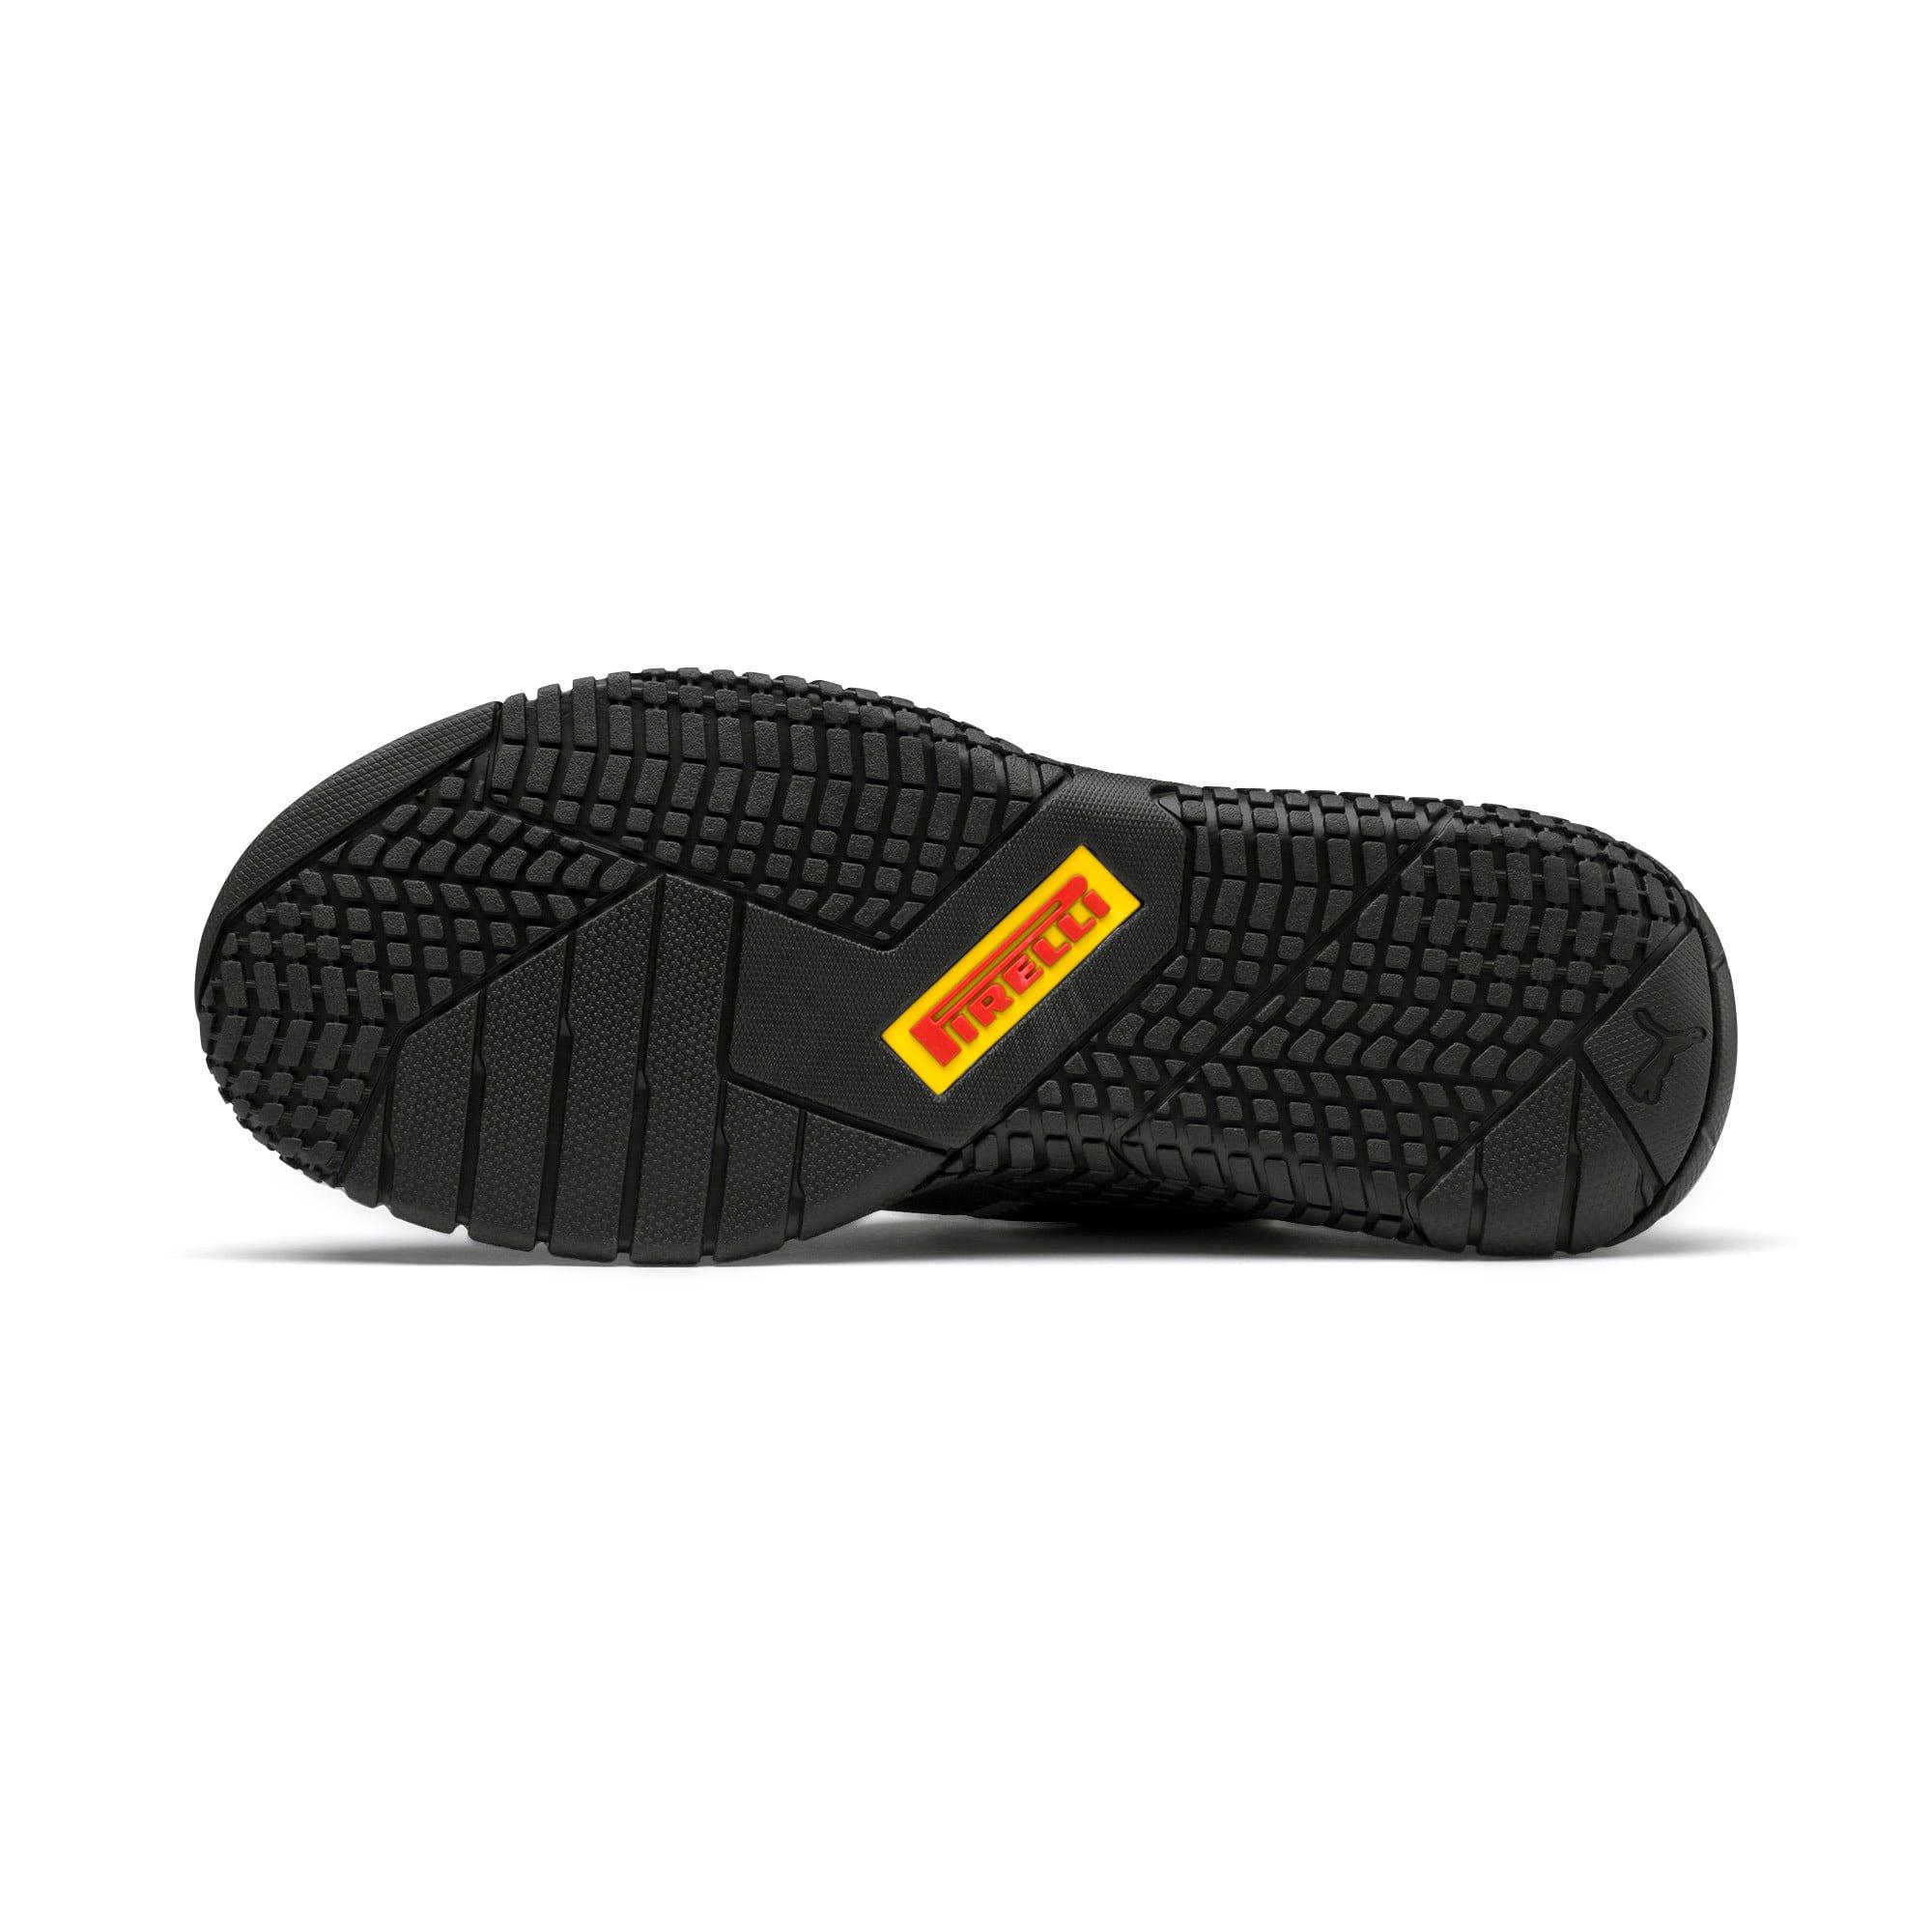 Thumbnail 4 of Replicat-X Pirelli Motorsport Shoes, Black-Black-Cyber Yellow, medium